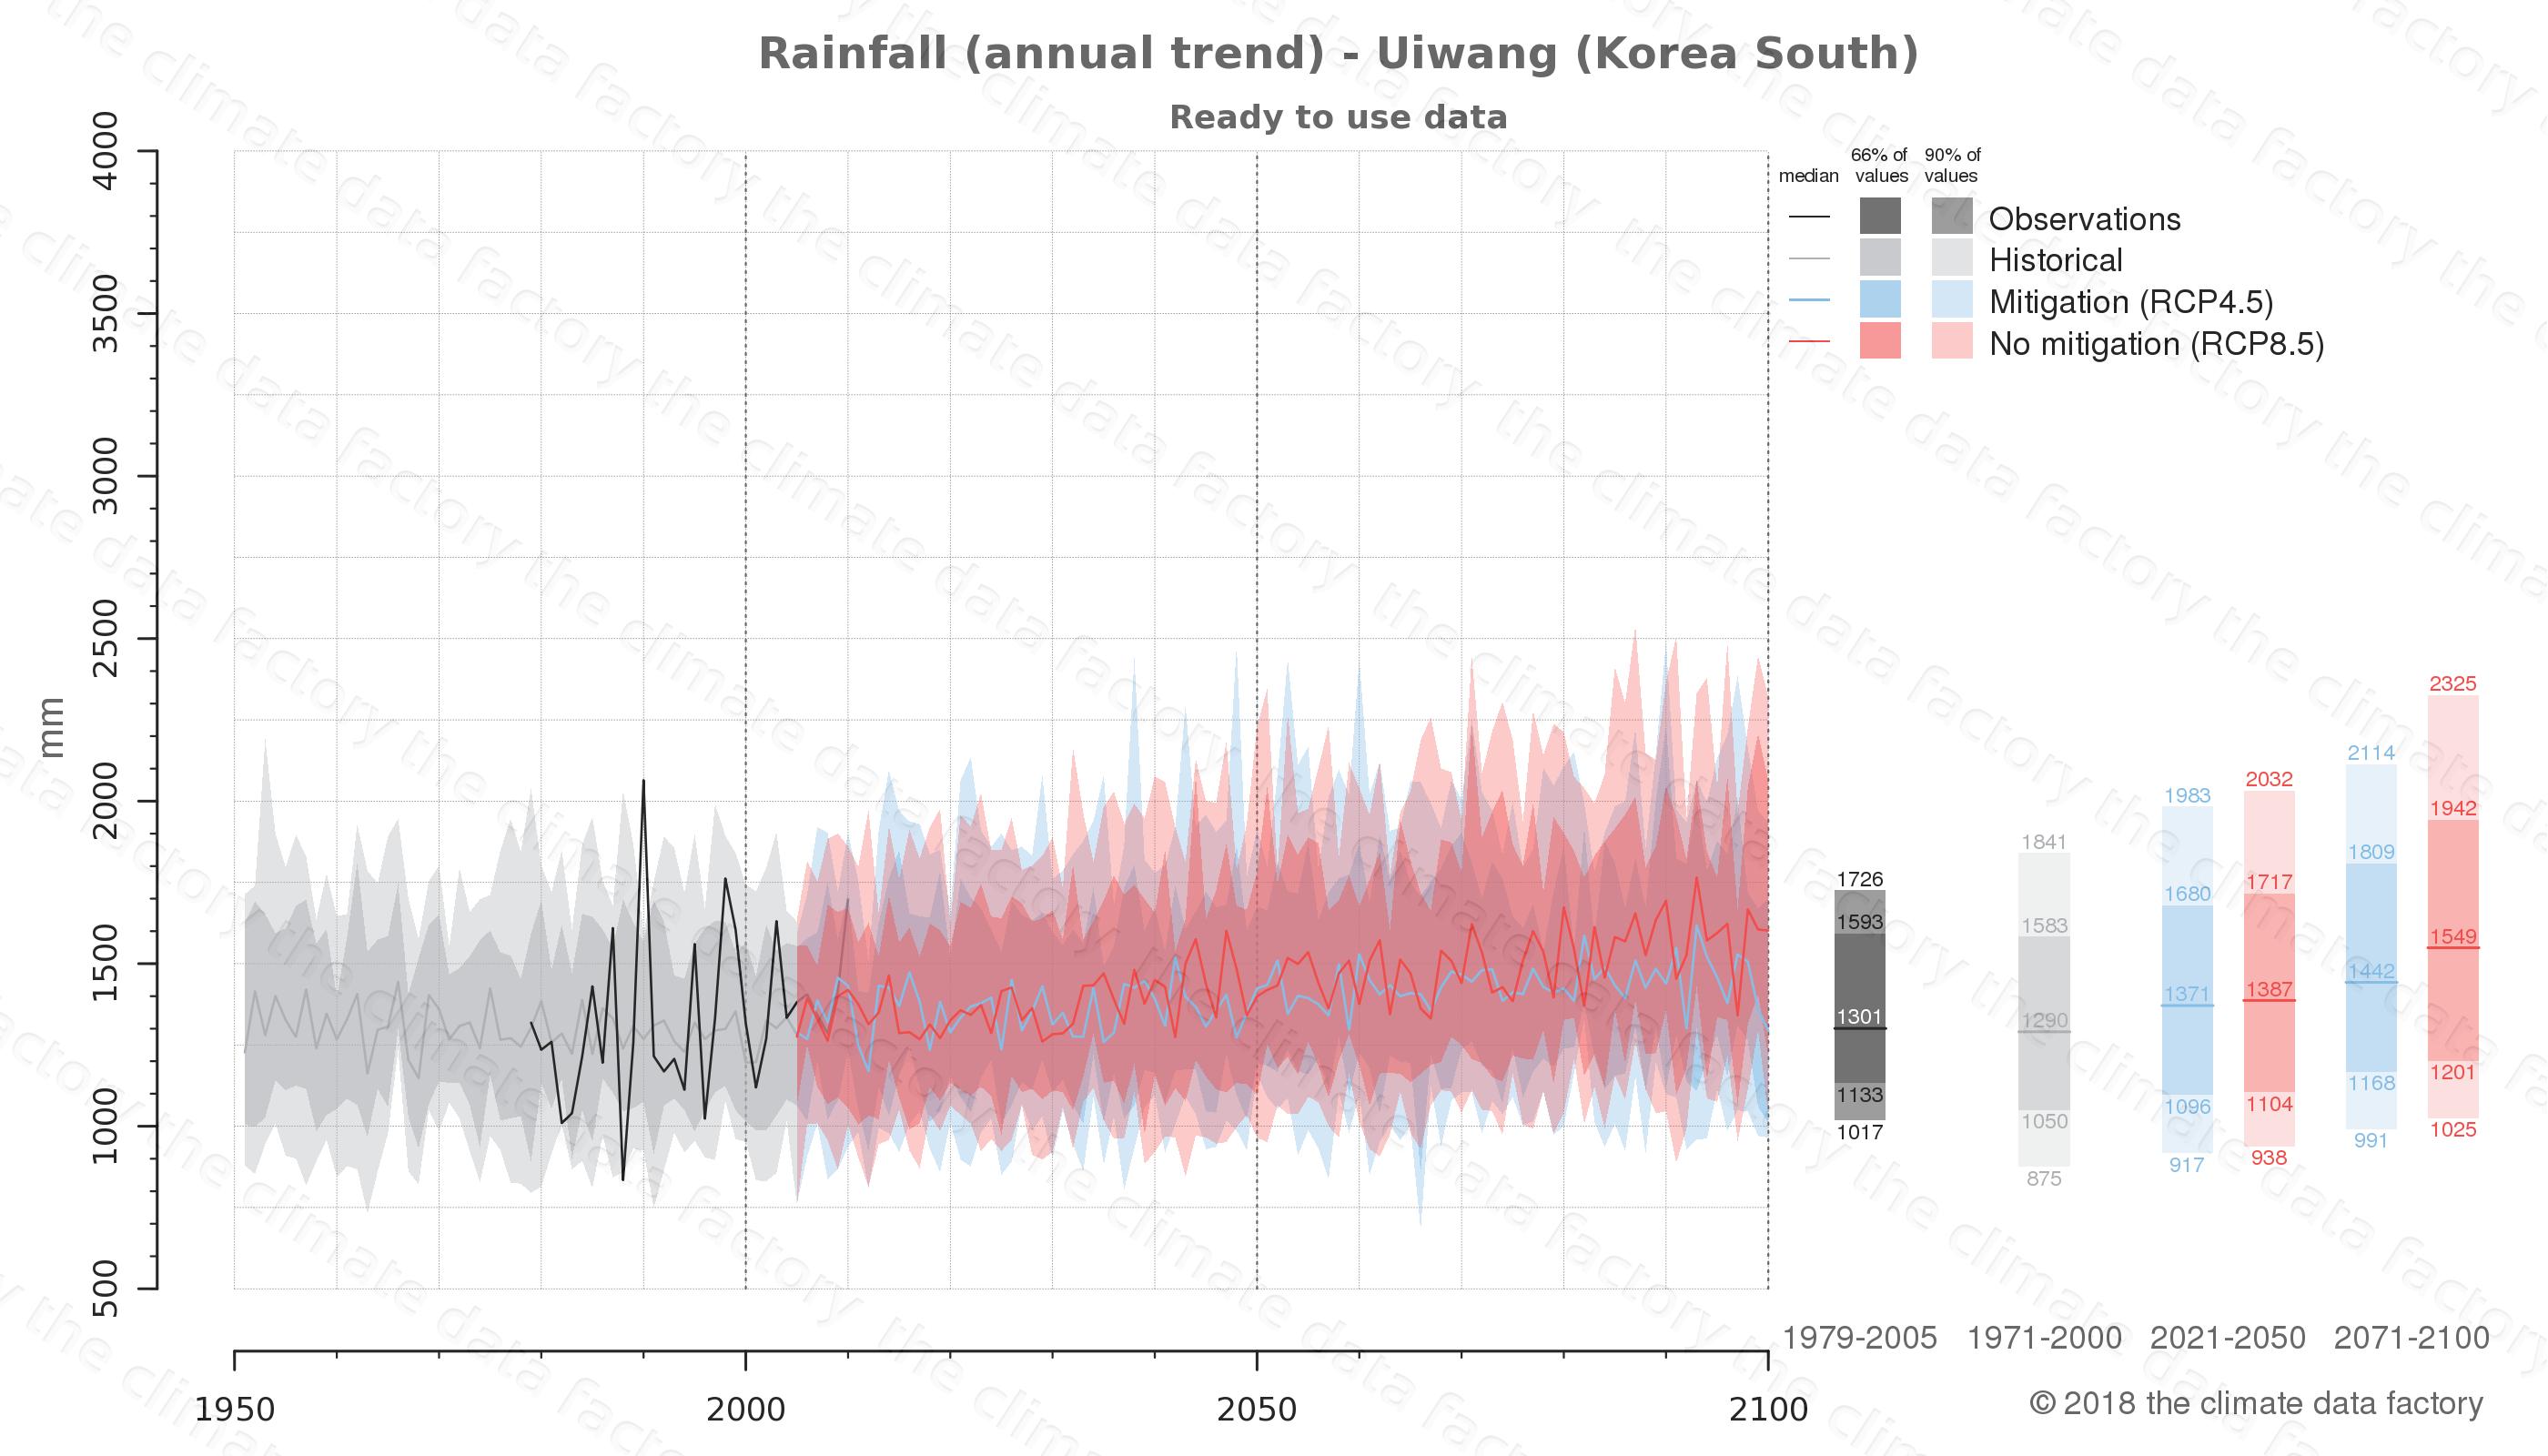 climate change data policy adaptation climate graph city data rainfall uiwang south korea